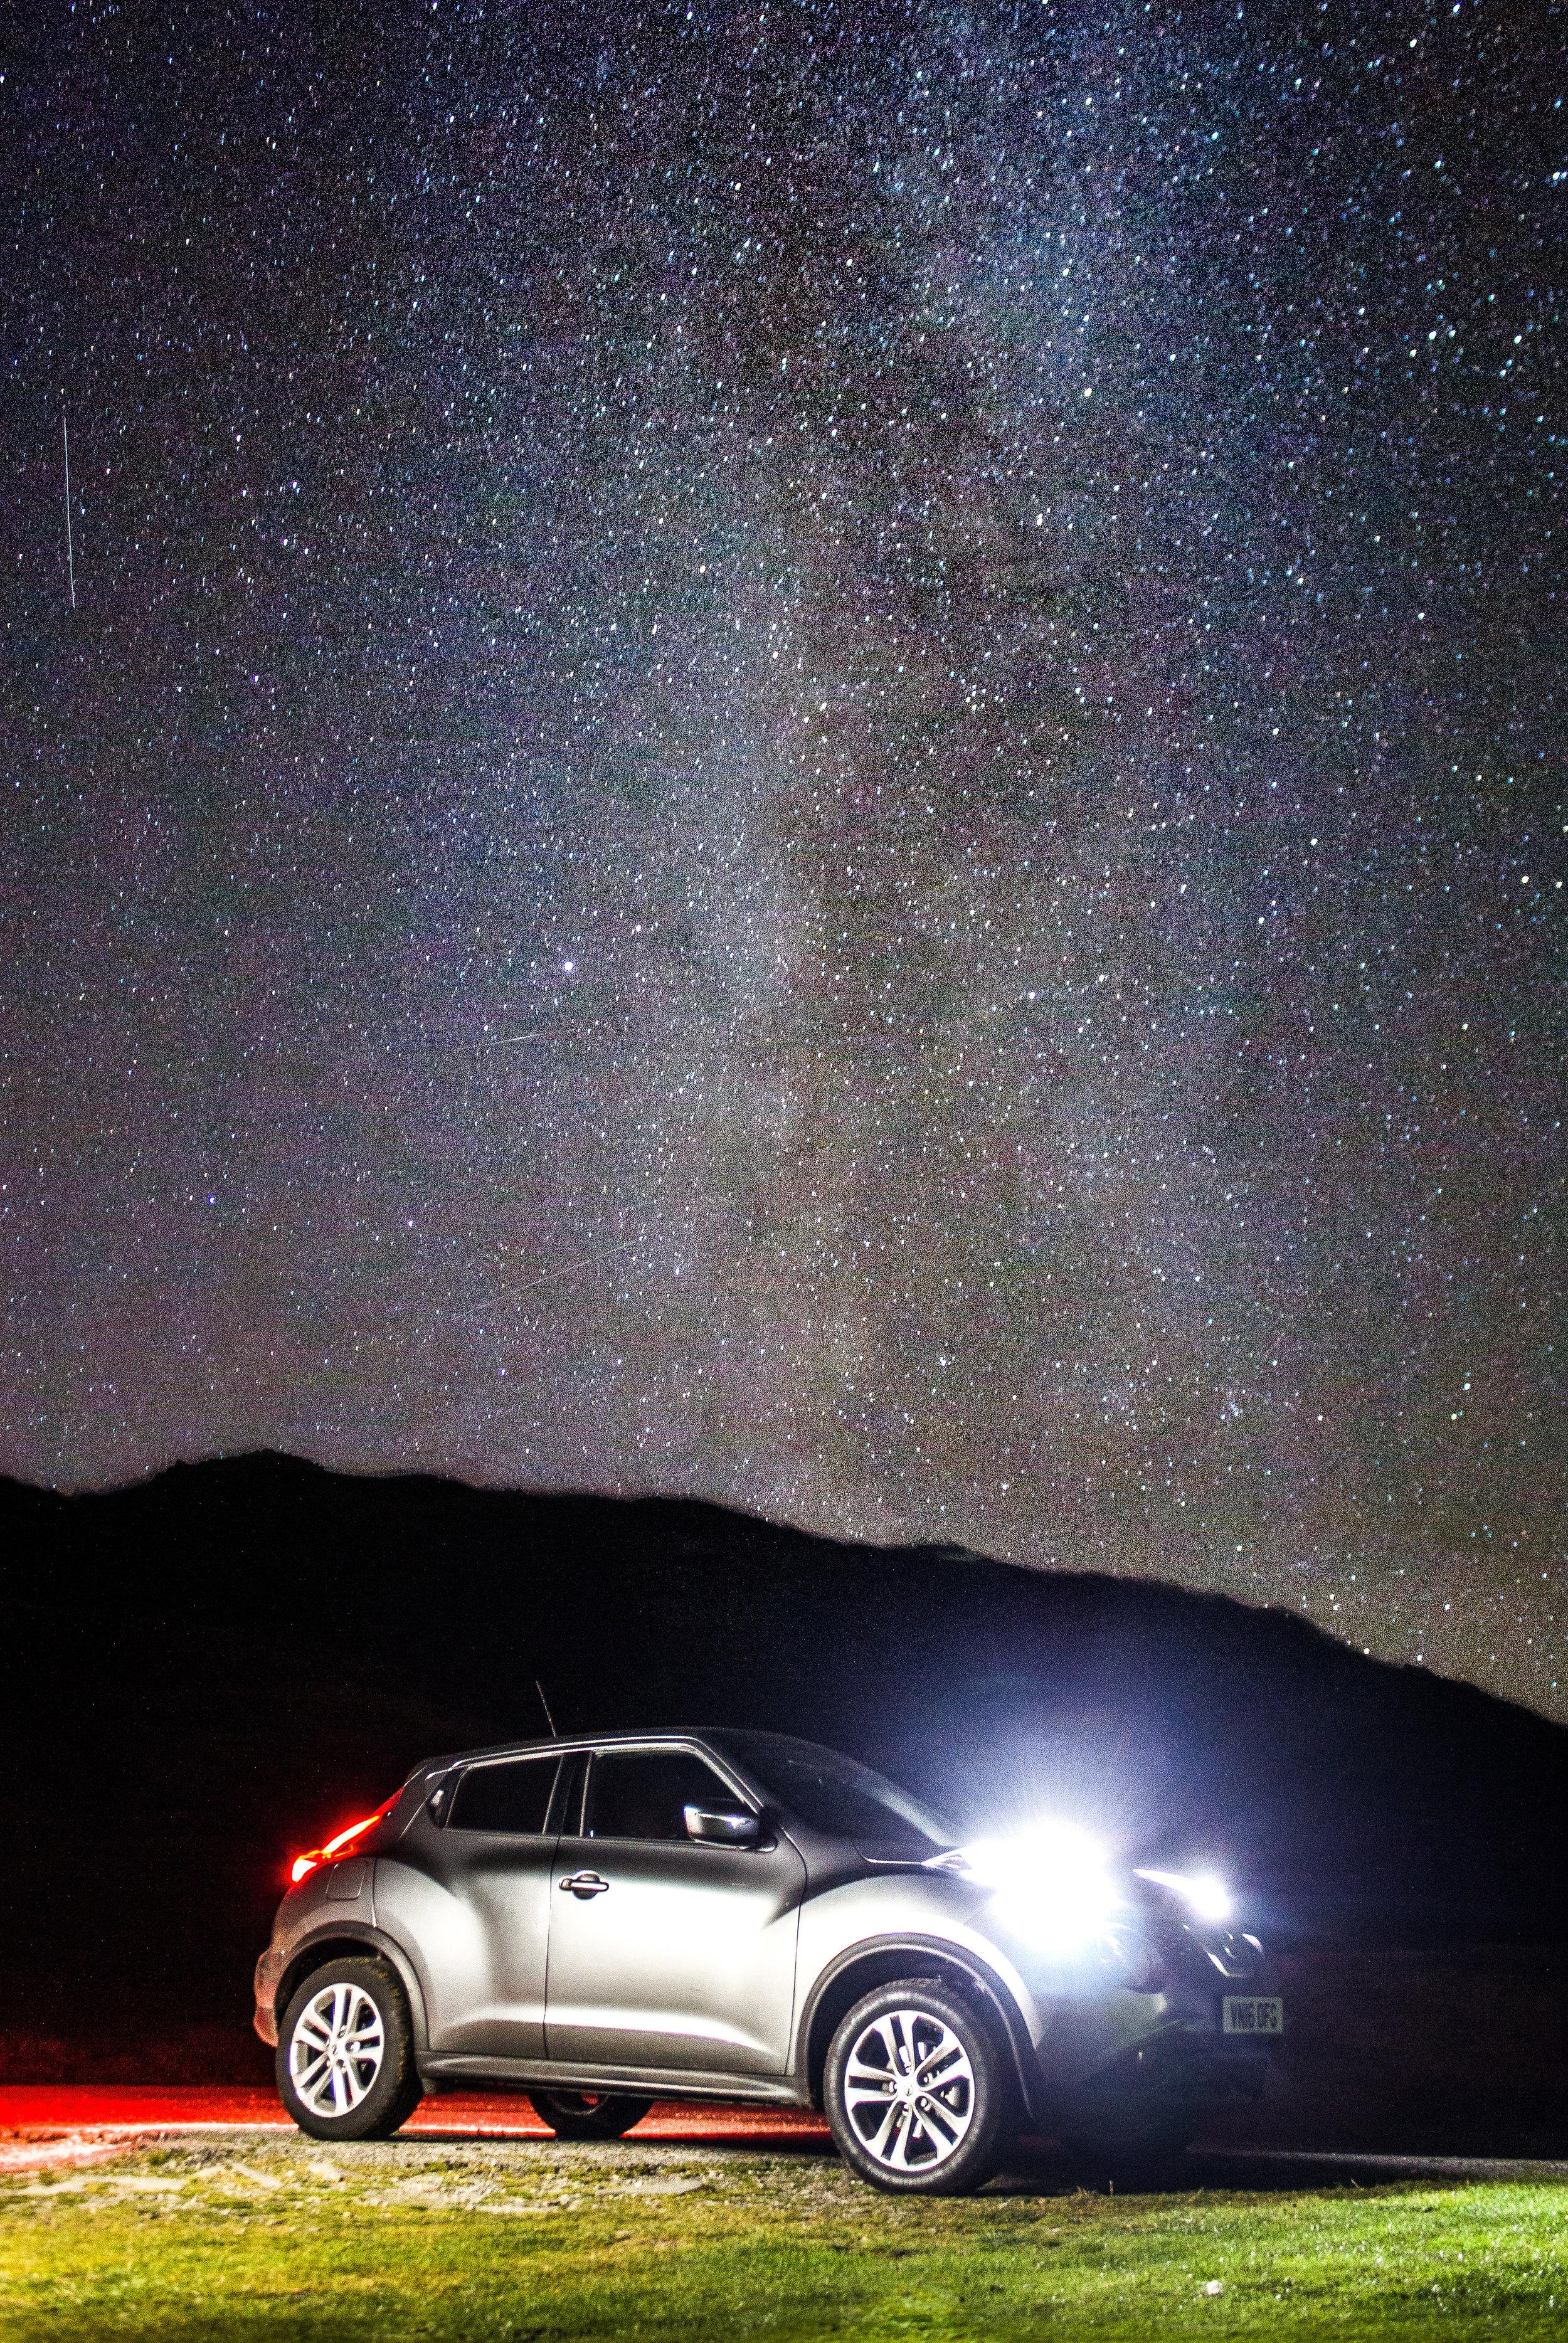 Nissan Juke and the night sky